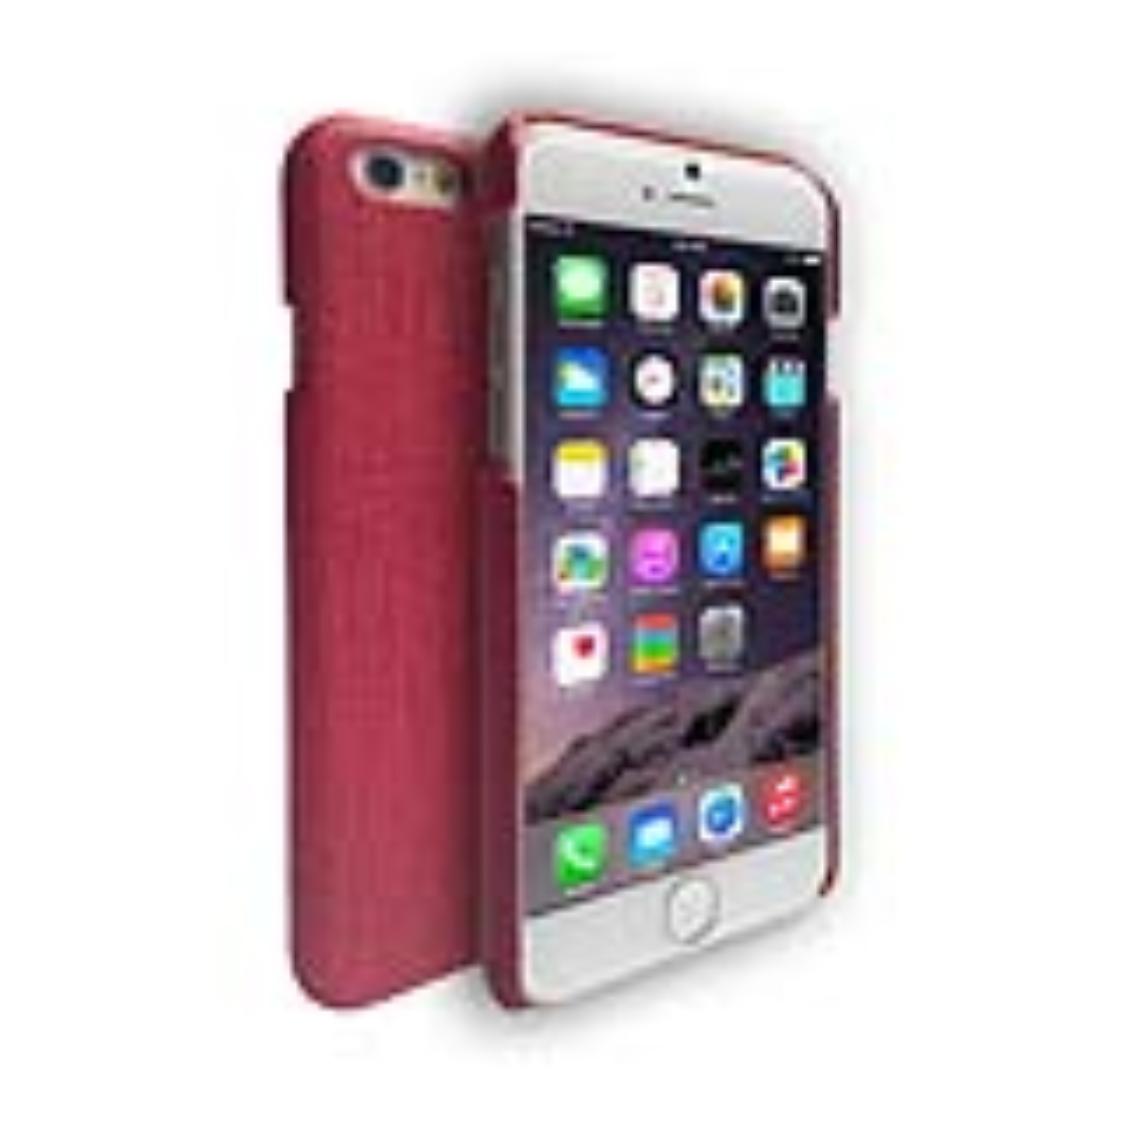 Patriot pouzdro pro iPhone® 6 plus červené